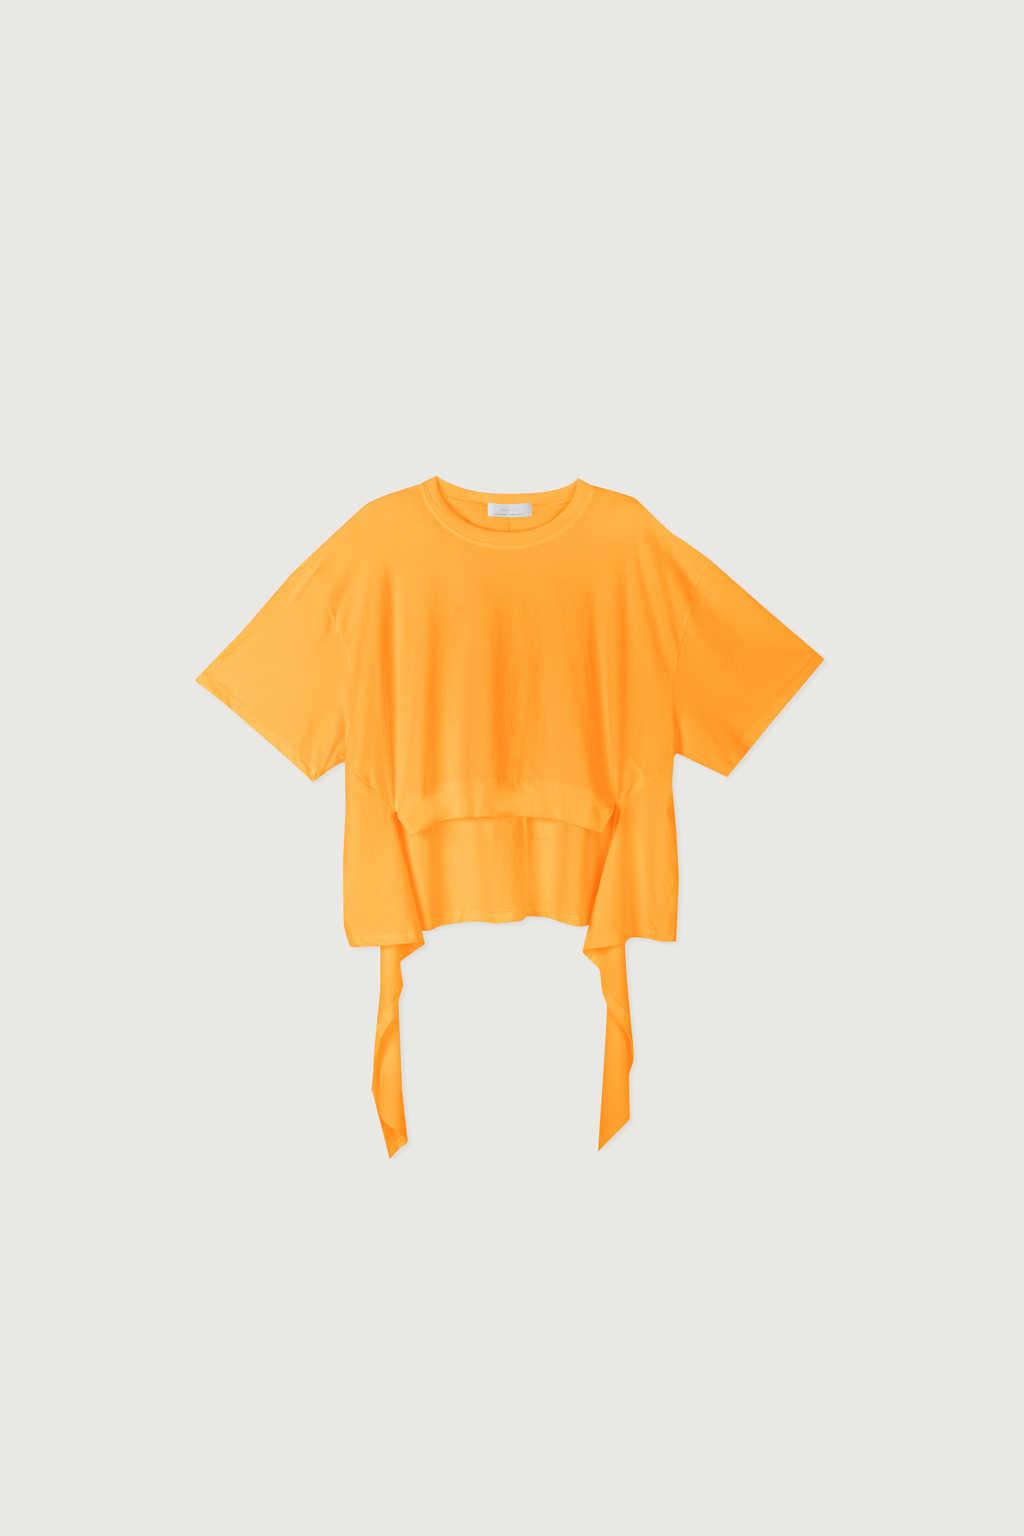 TShirt K151 Orange 7